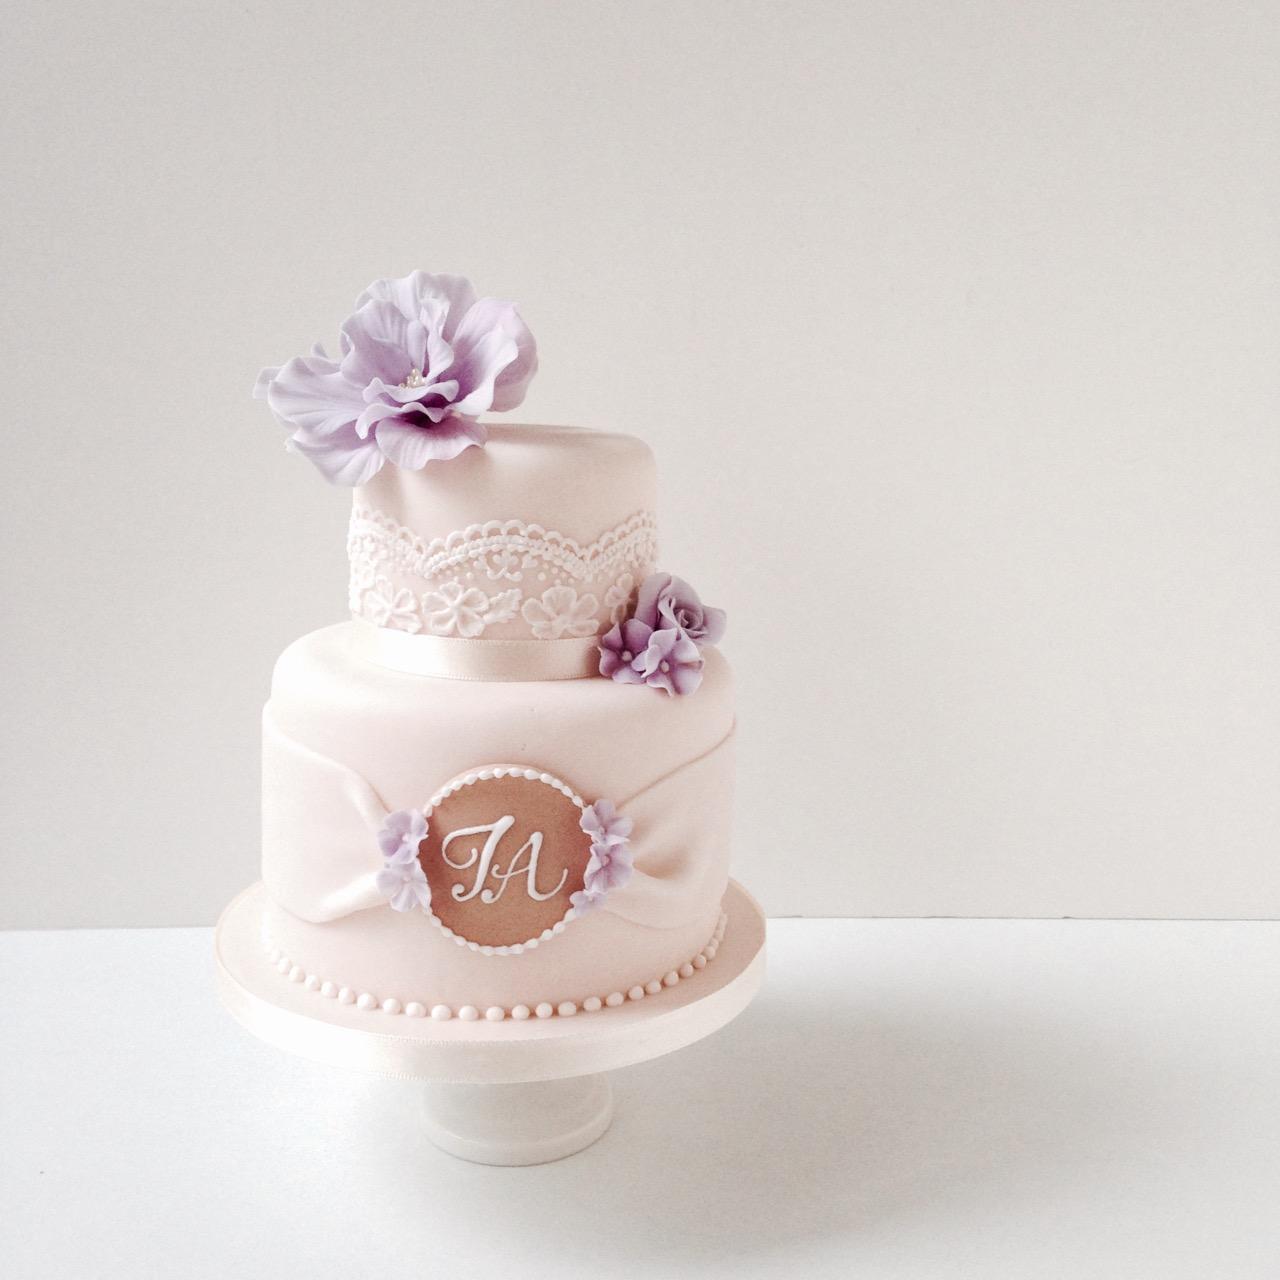 20150727-cakepoptower1